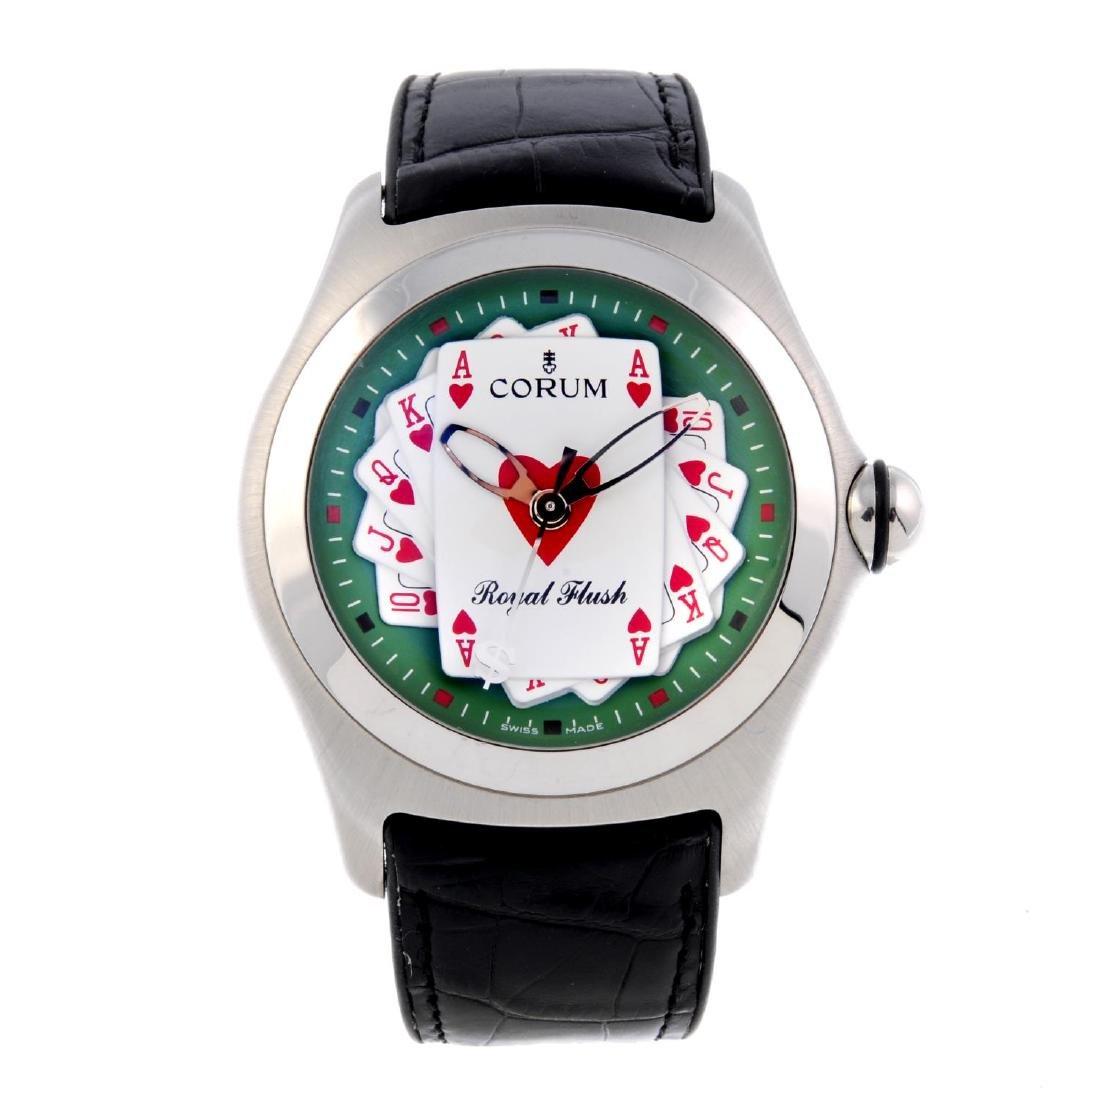 CORUM - a gentleman's Royal Flush wrist watch.